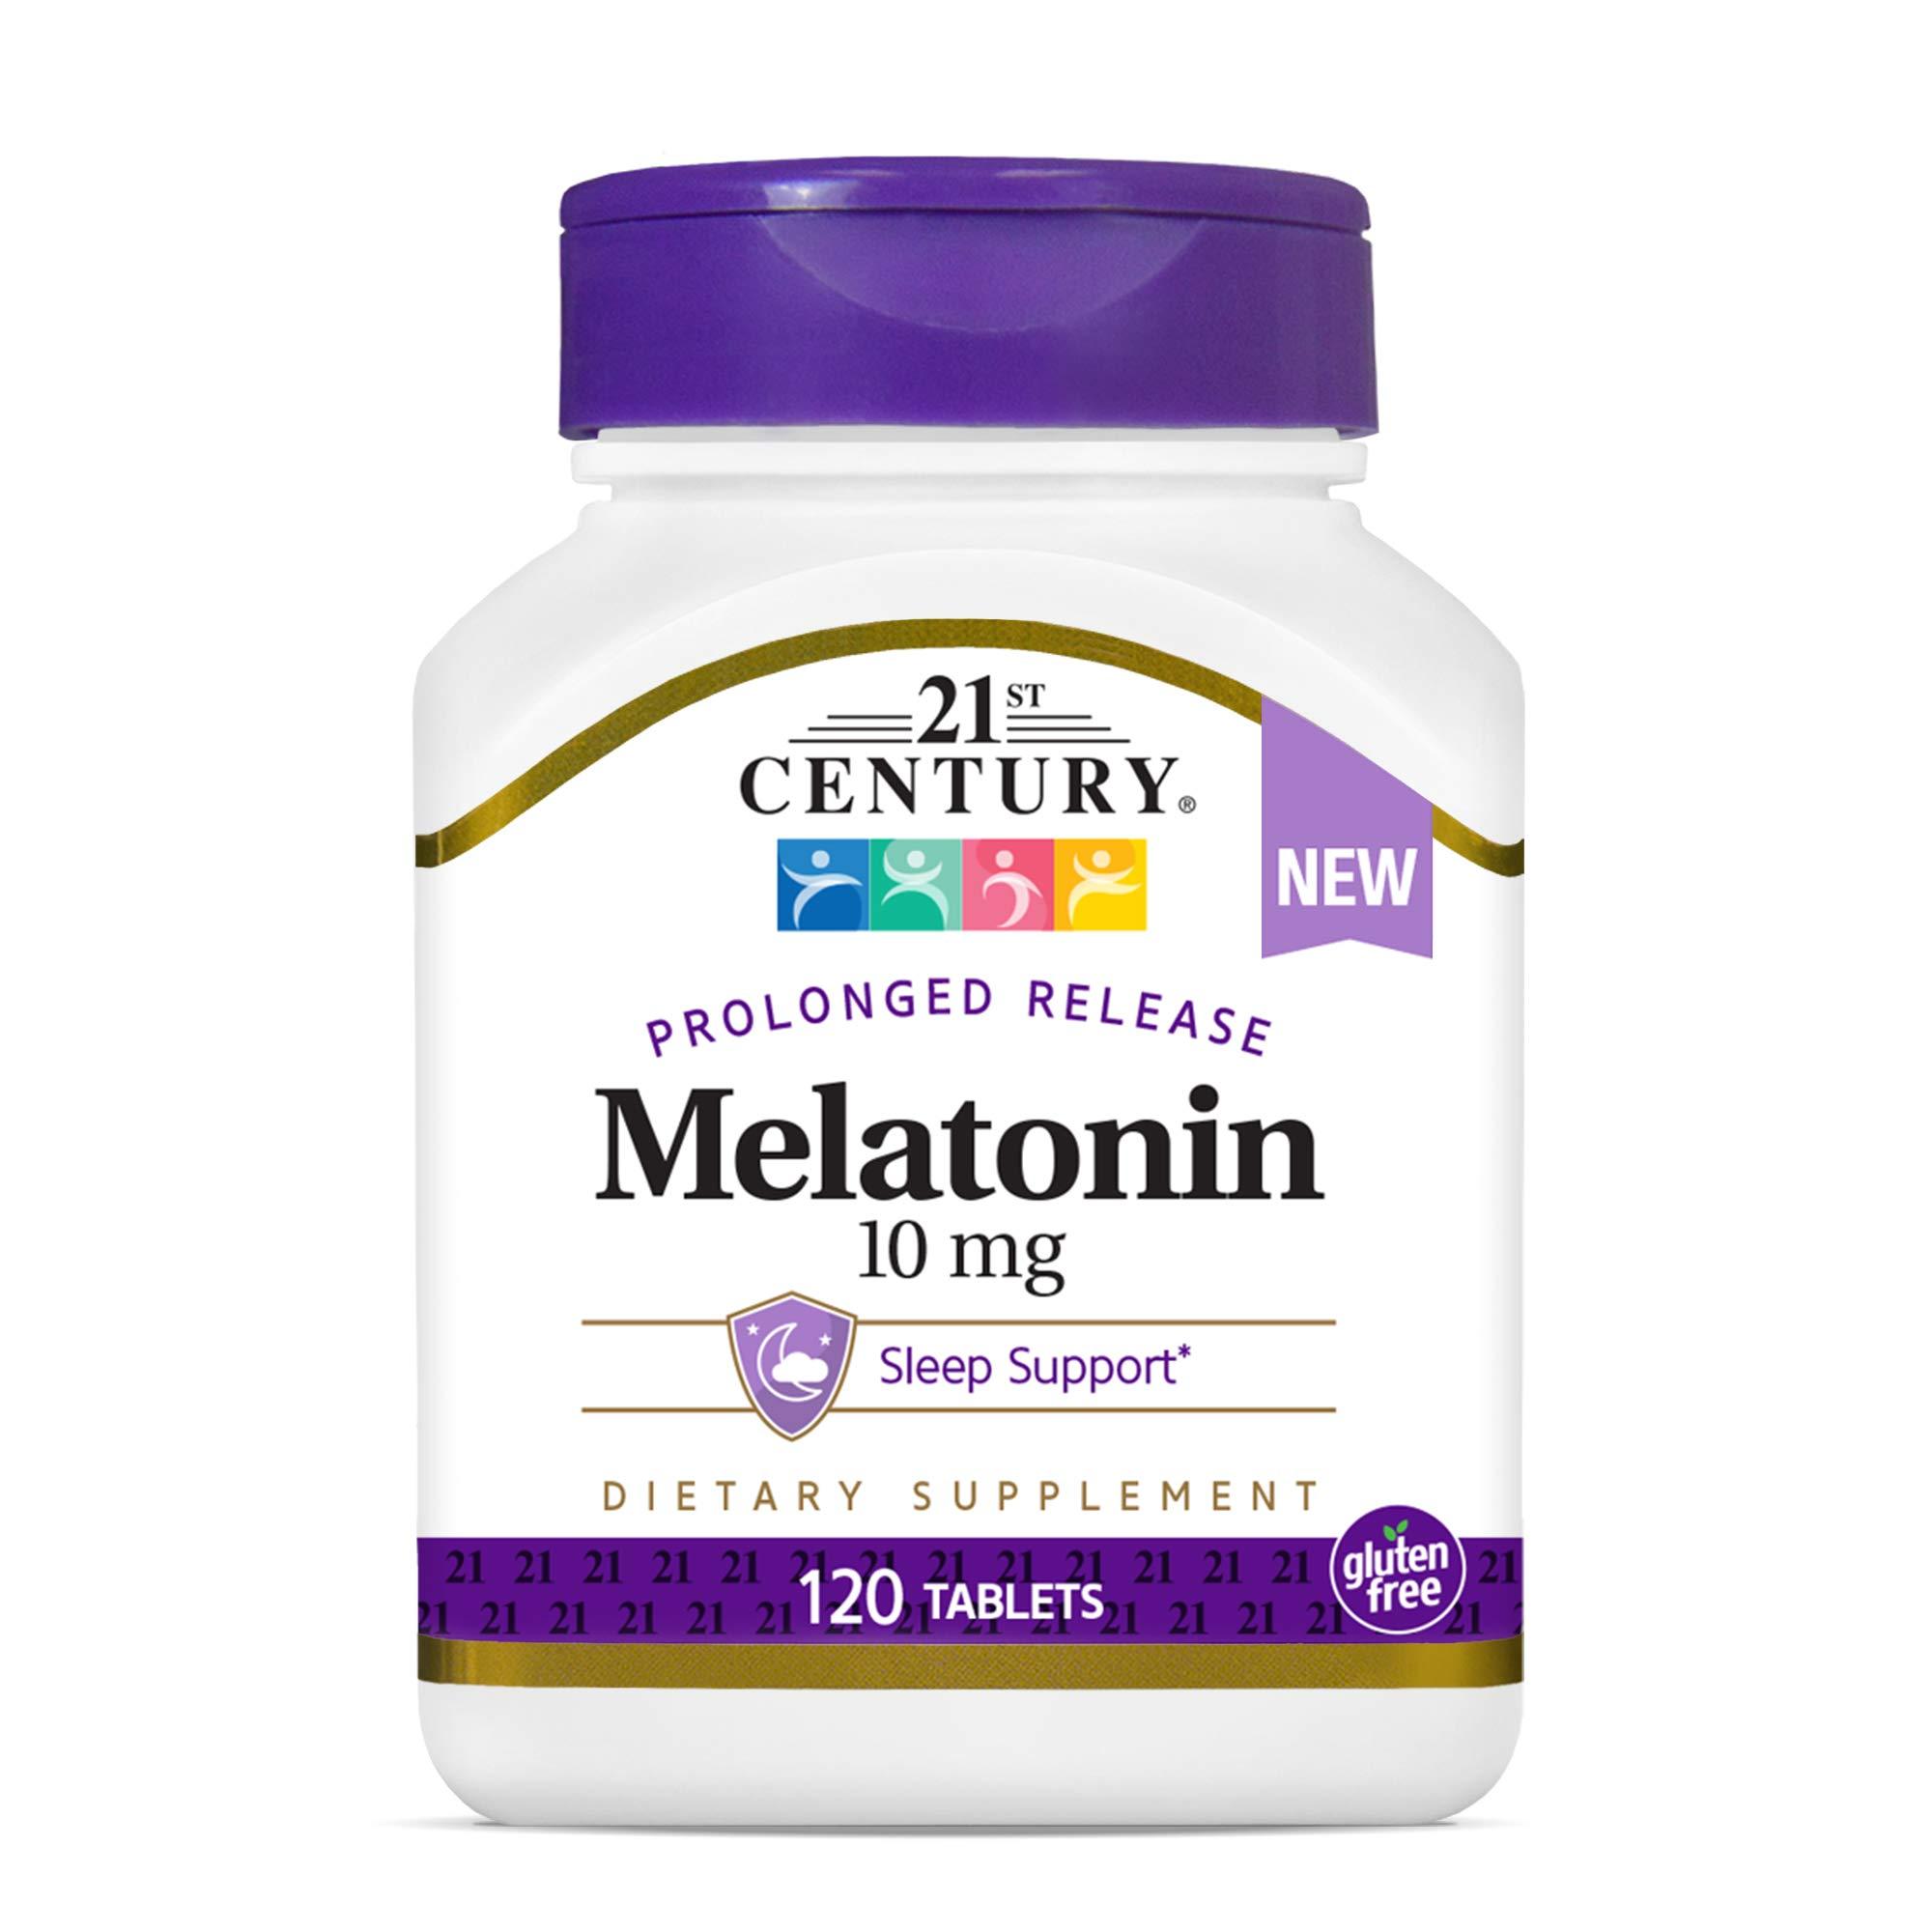 21st Century Melatonin 10 Mg Prolonged Release, 120 Count